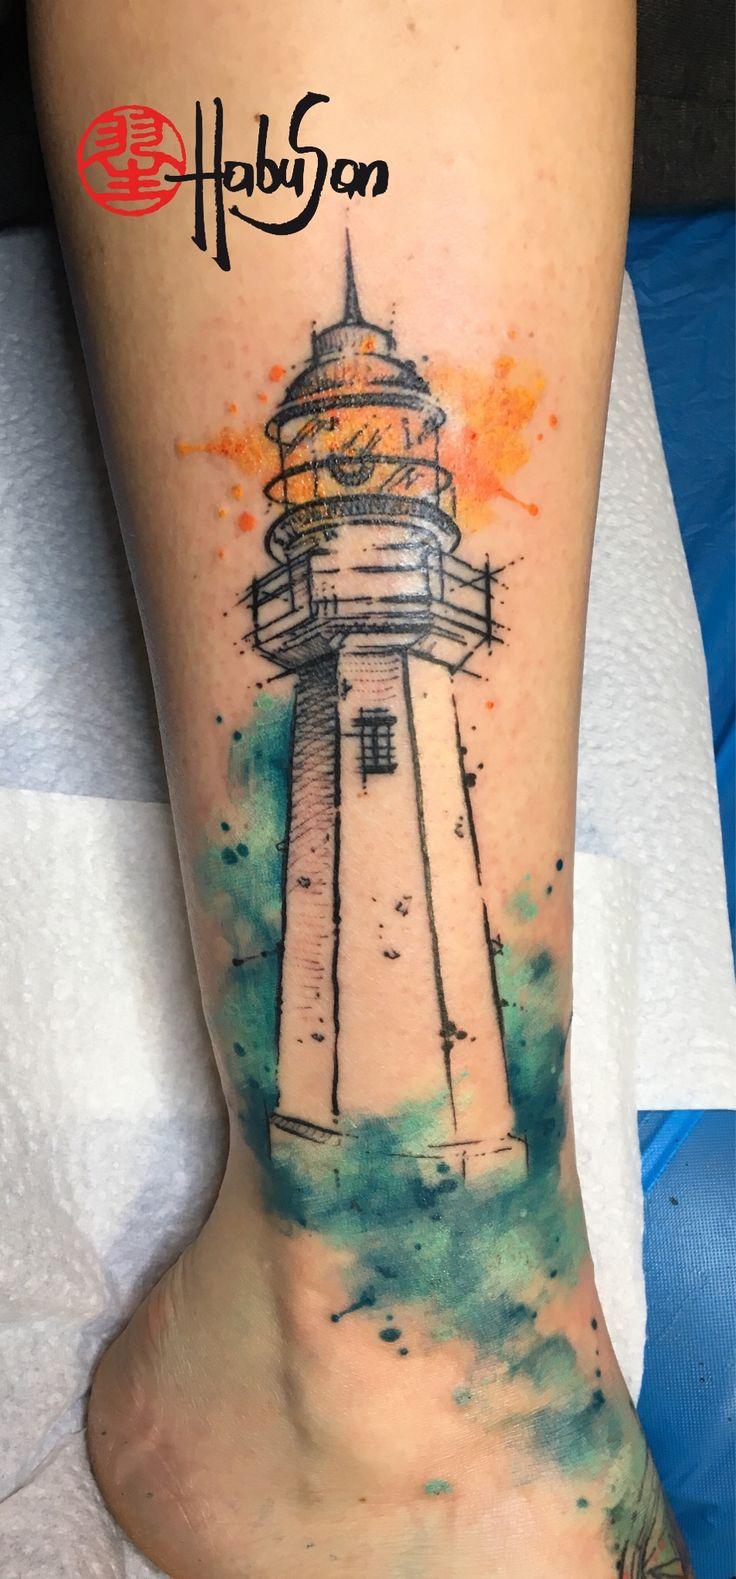 Ein Leuchtturm in sketchy Optik mit Watercolour Hintergrund! Danke, Julia! #tattoo #habusan #Wien #watercolourtattoo